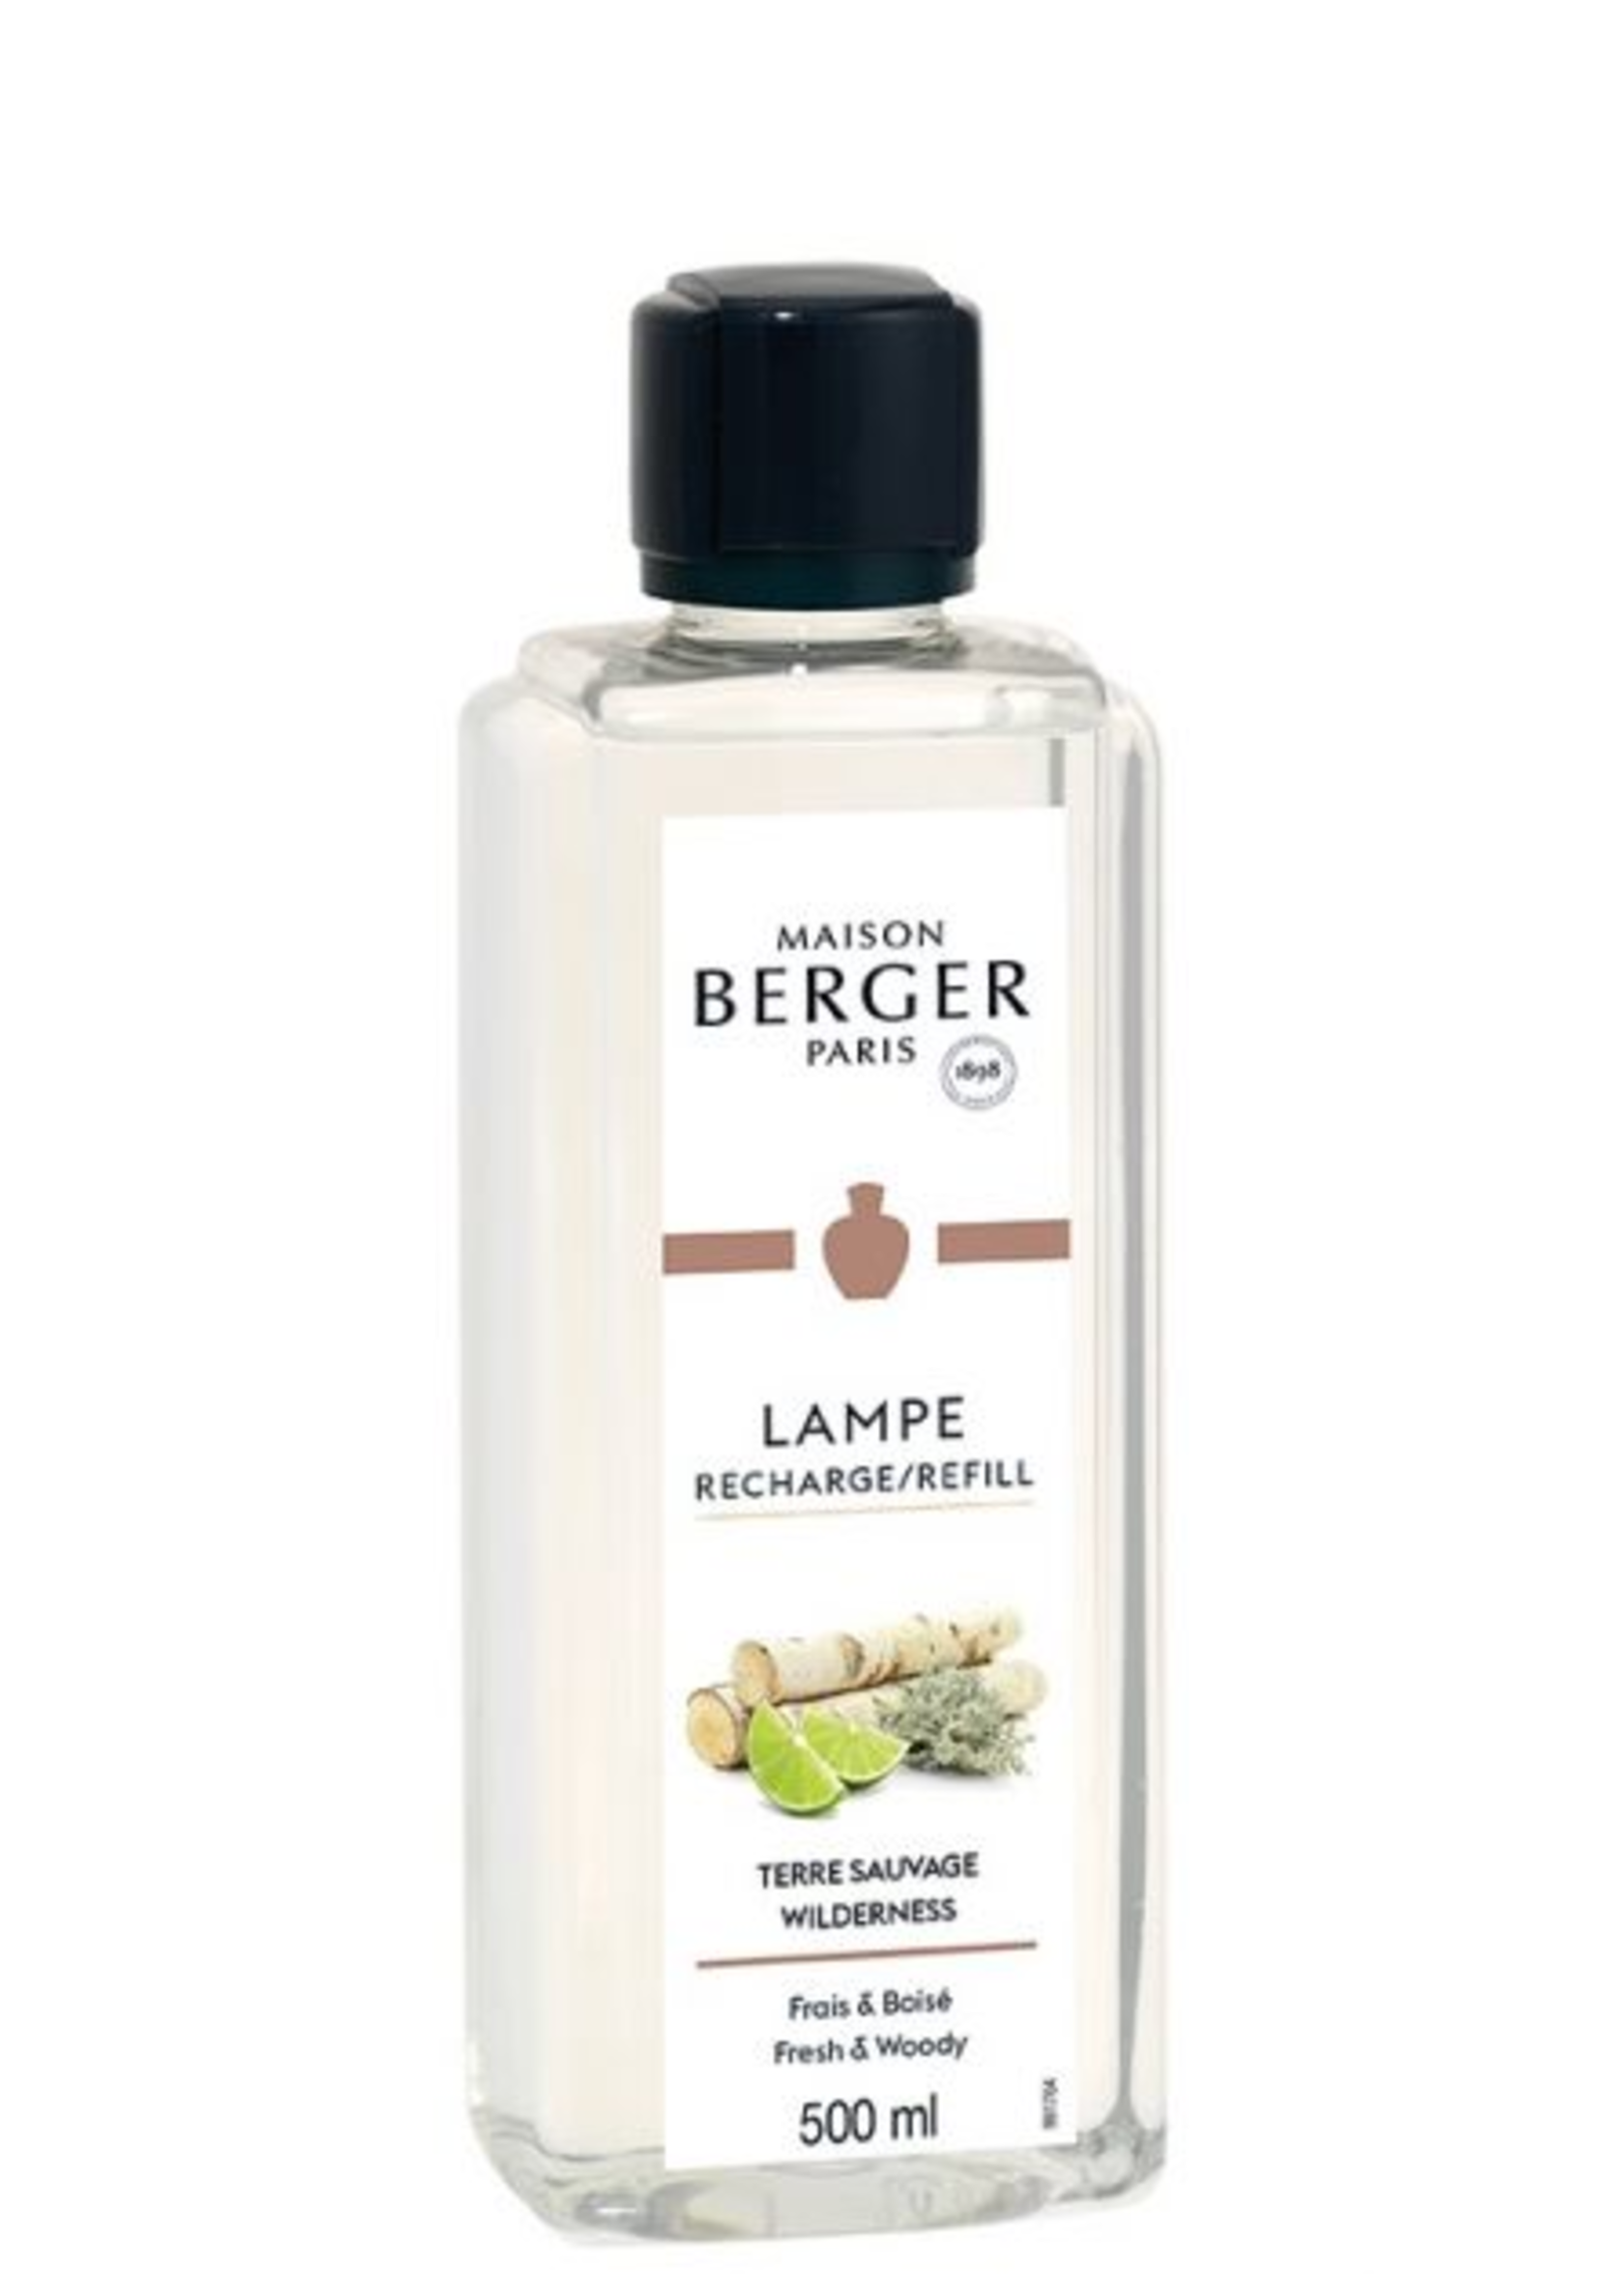 Lampe Berger Huisparfum Terre Sauvage